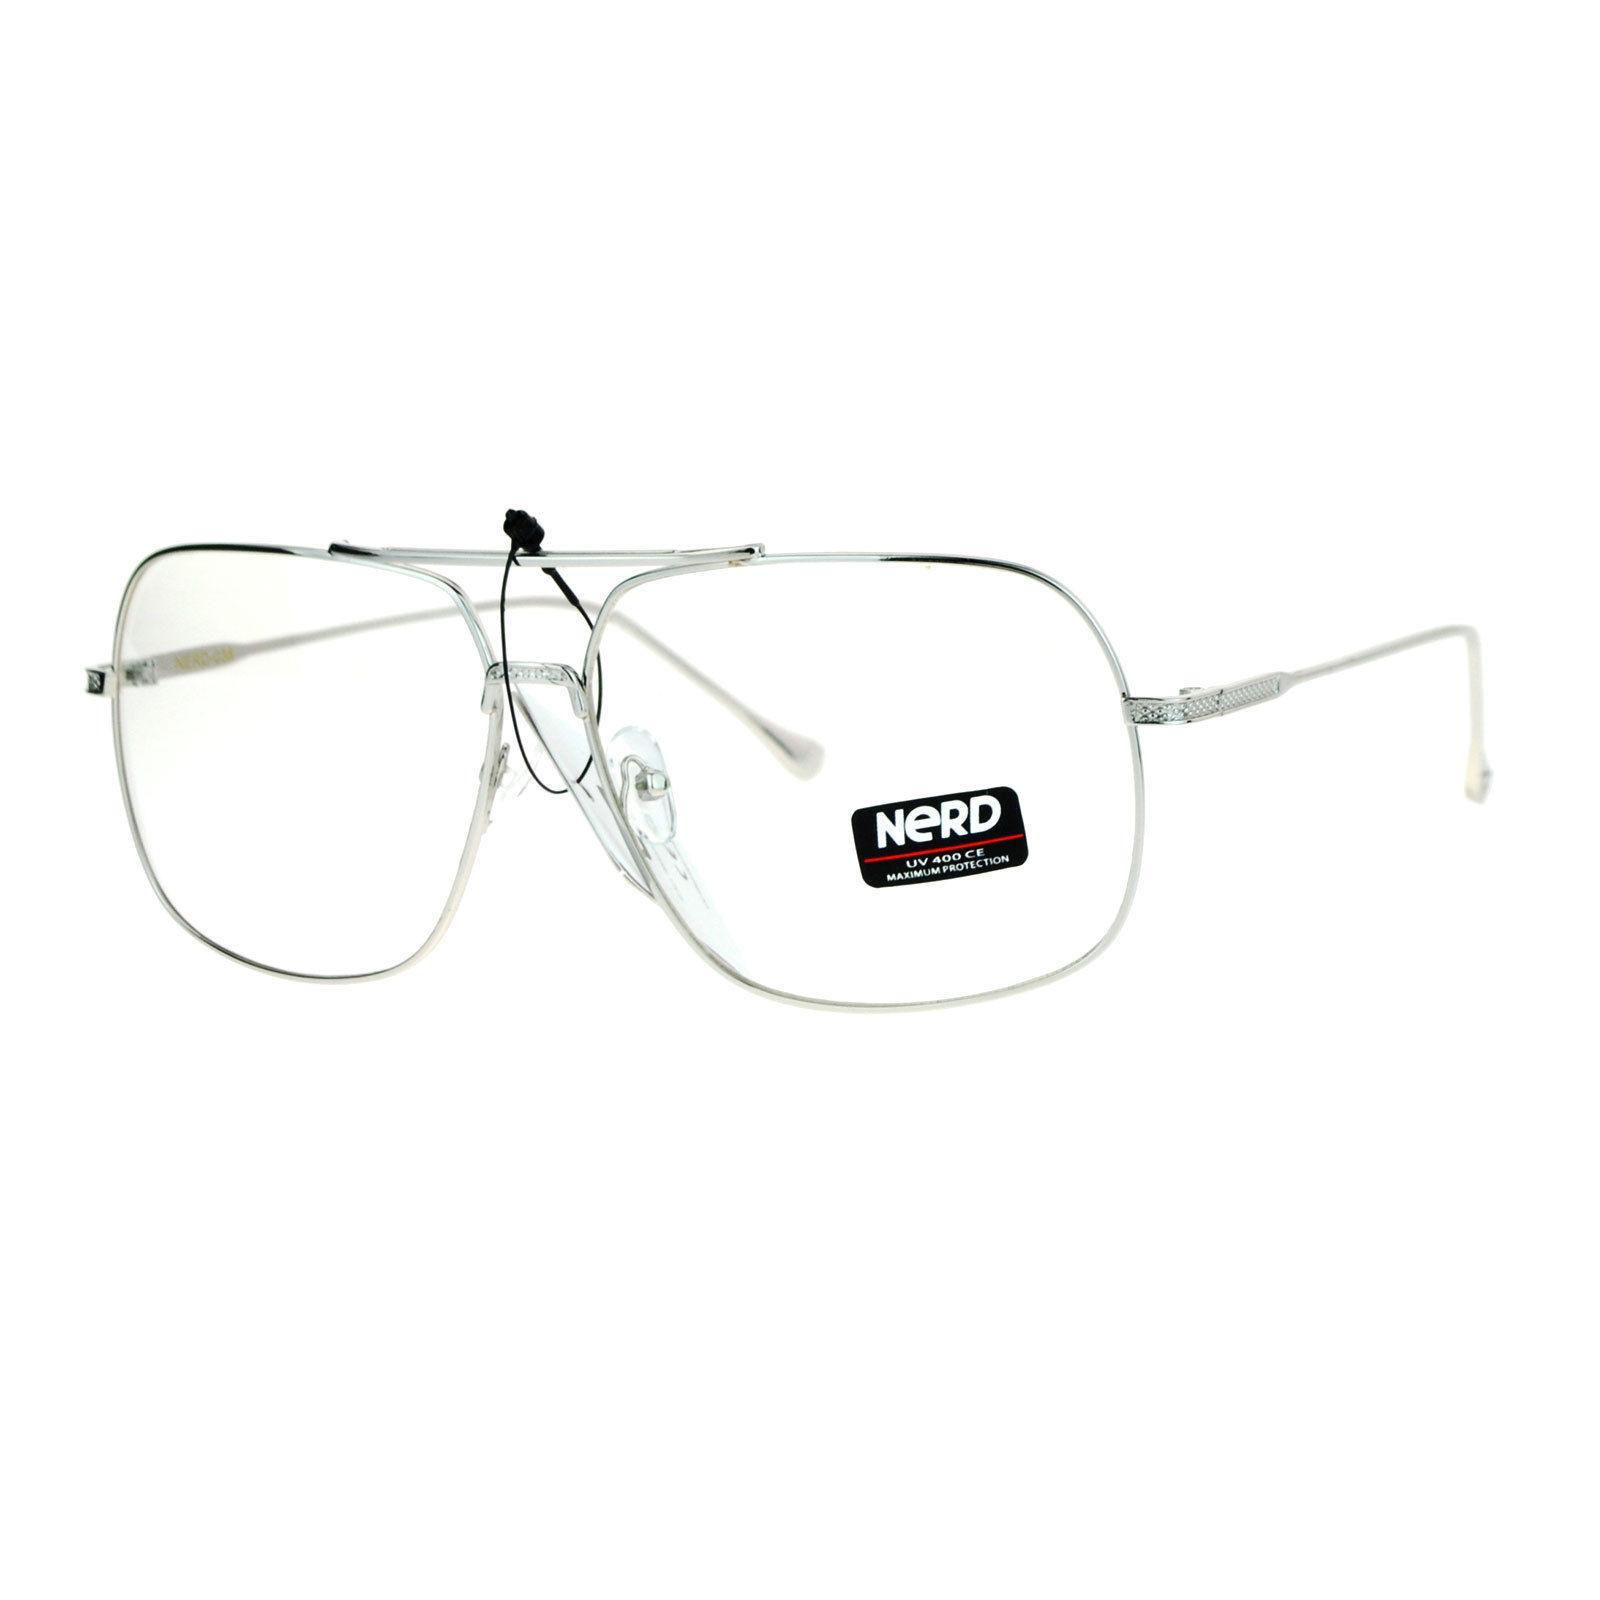 Clear Lens Eyeglasses Oversized Square Metal Vintage Driver Fashion